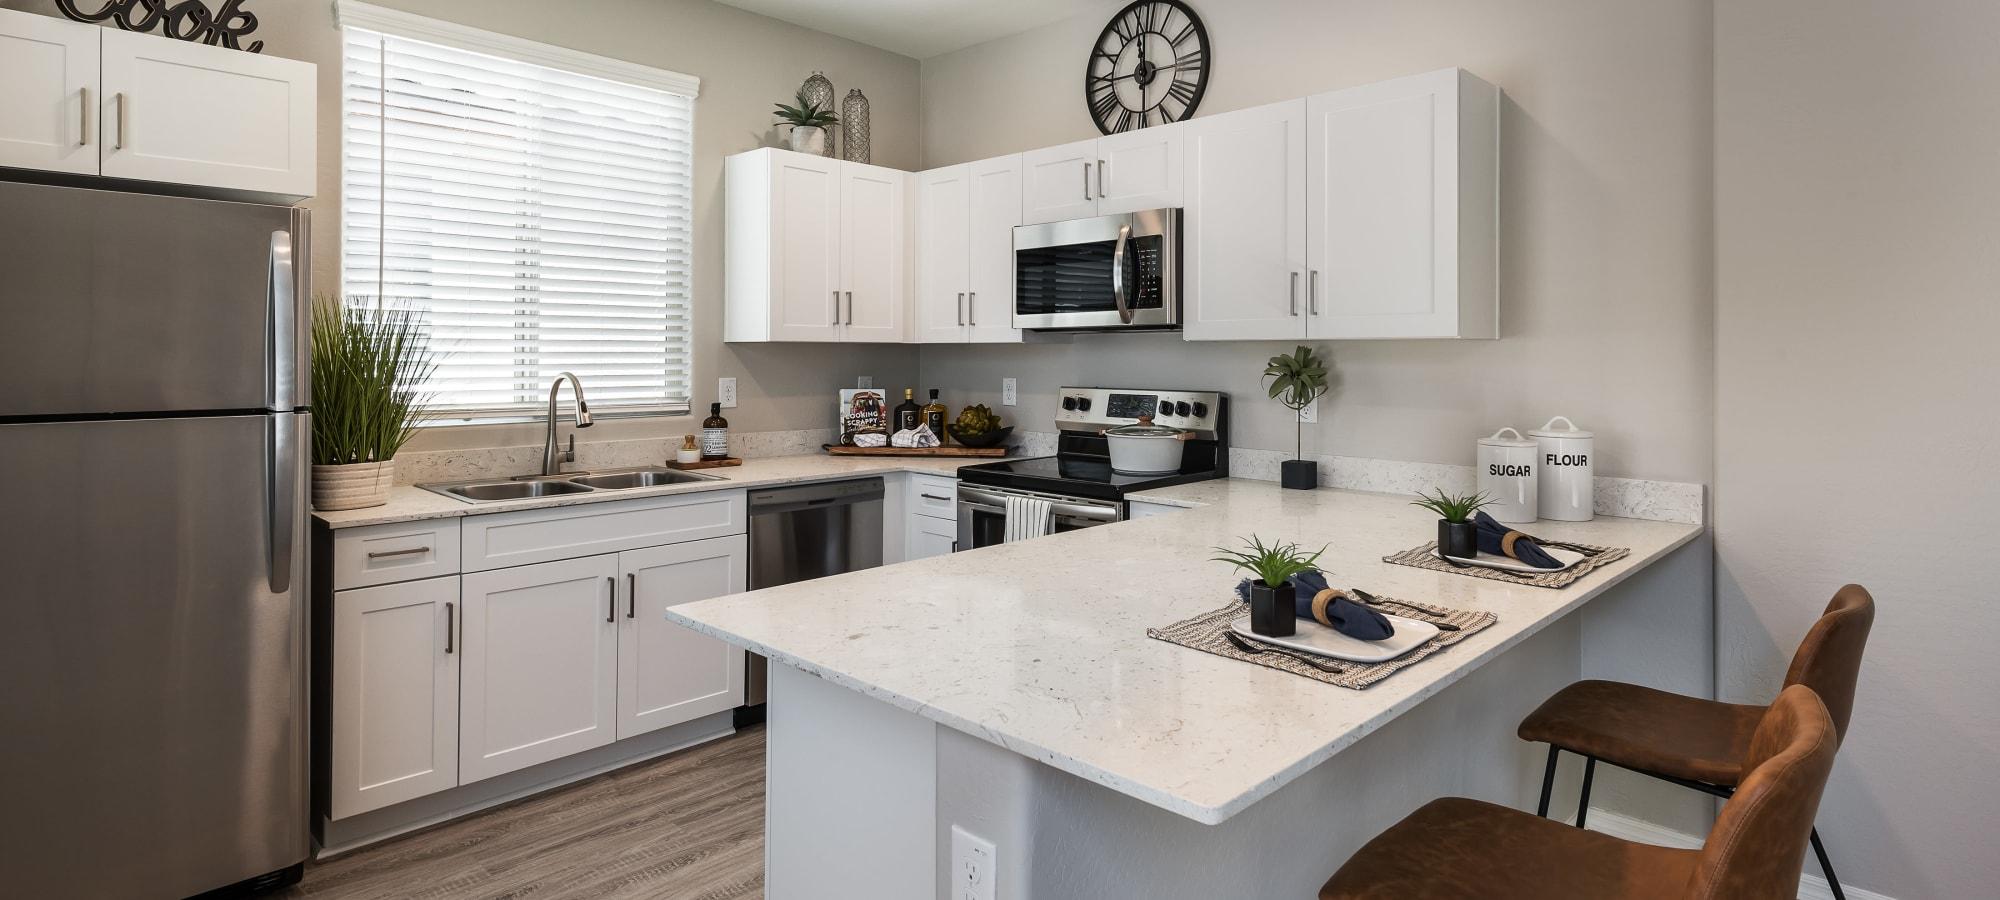 Spacious interior and kitchen at TerraLane at Canyon Trails in Goodyear, Arizona